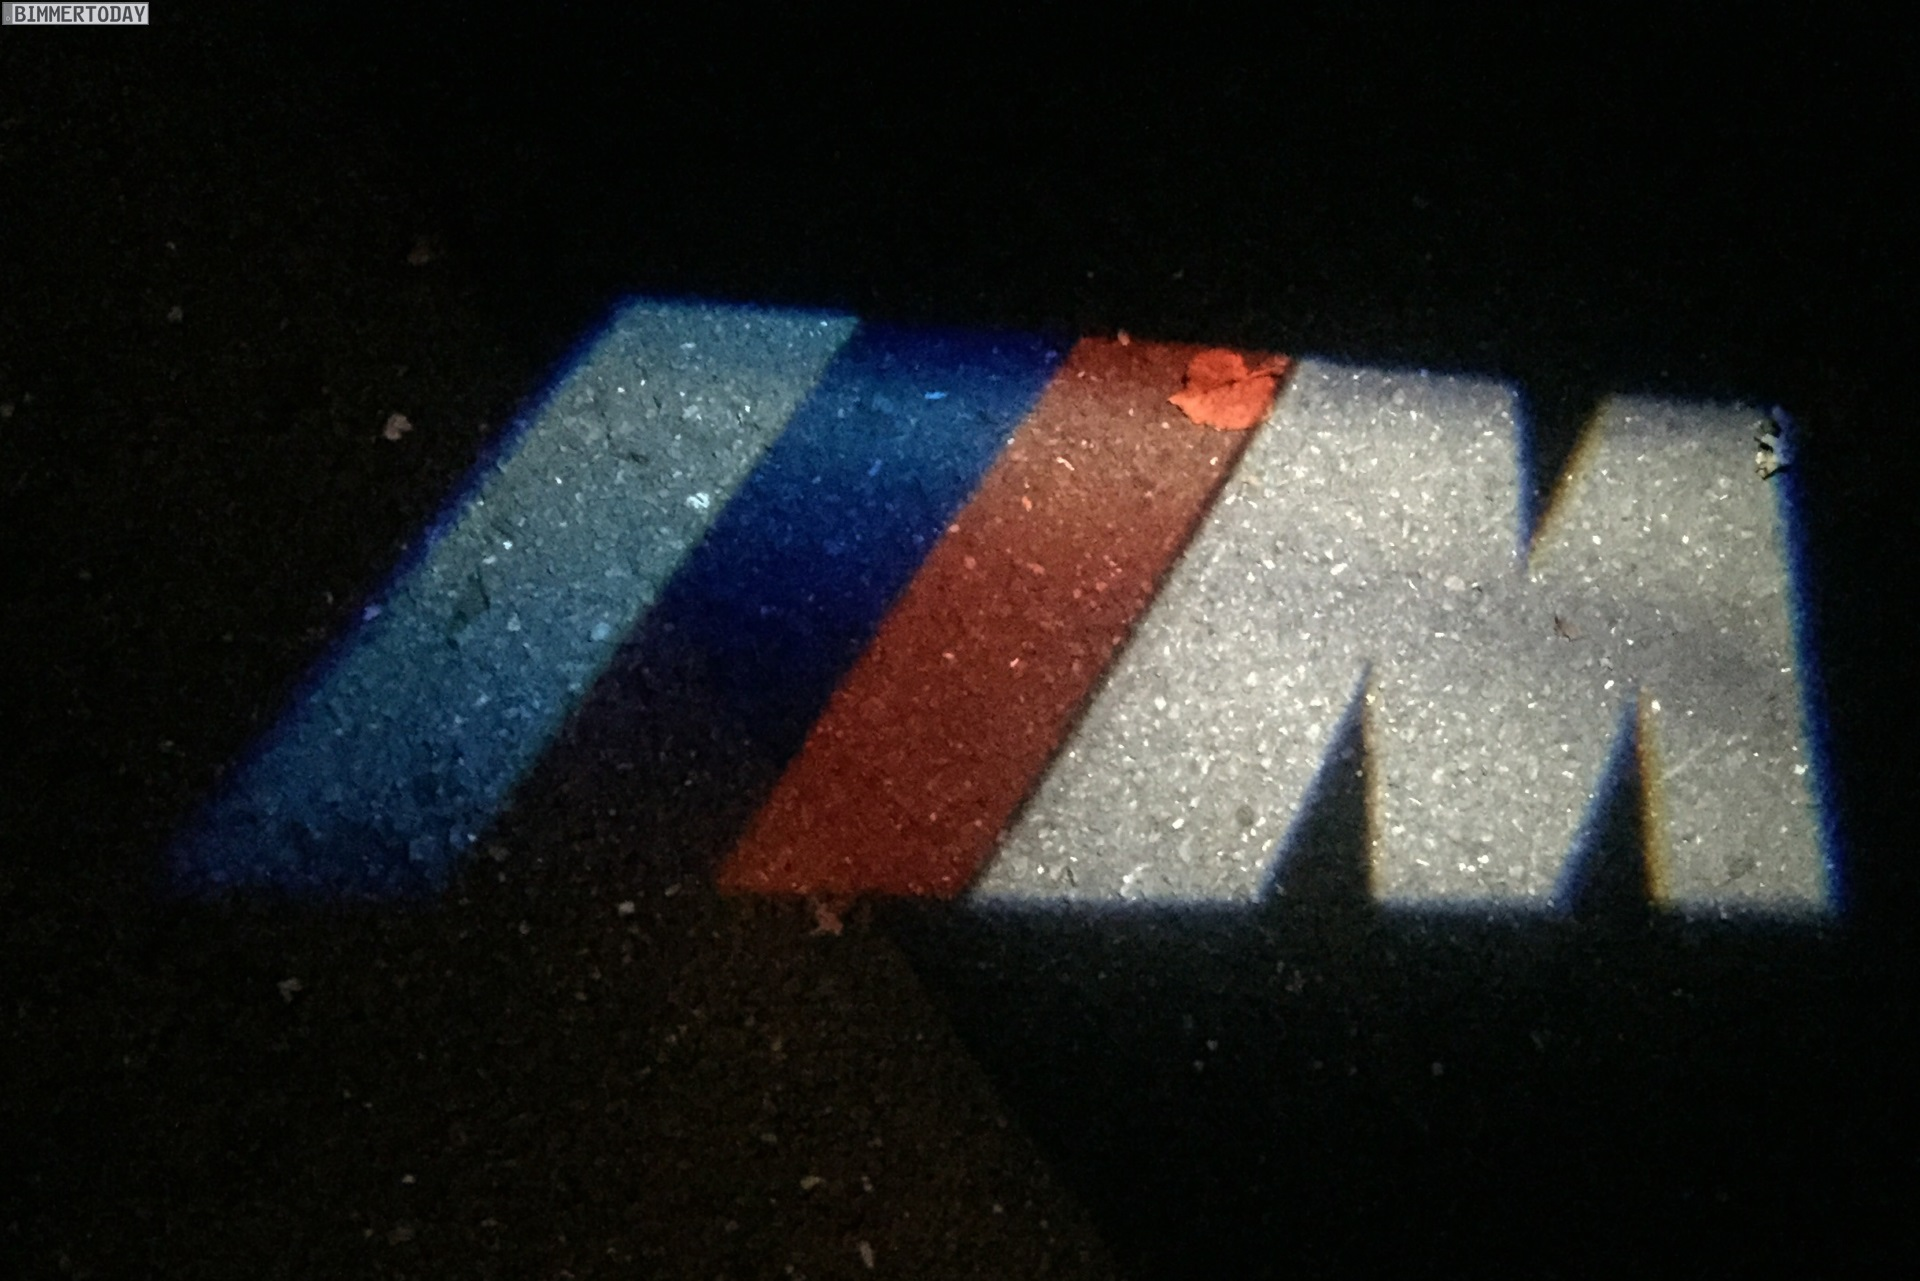 European Auto Works >> BMW LED Door Projector - How It Works